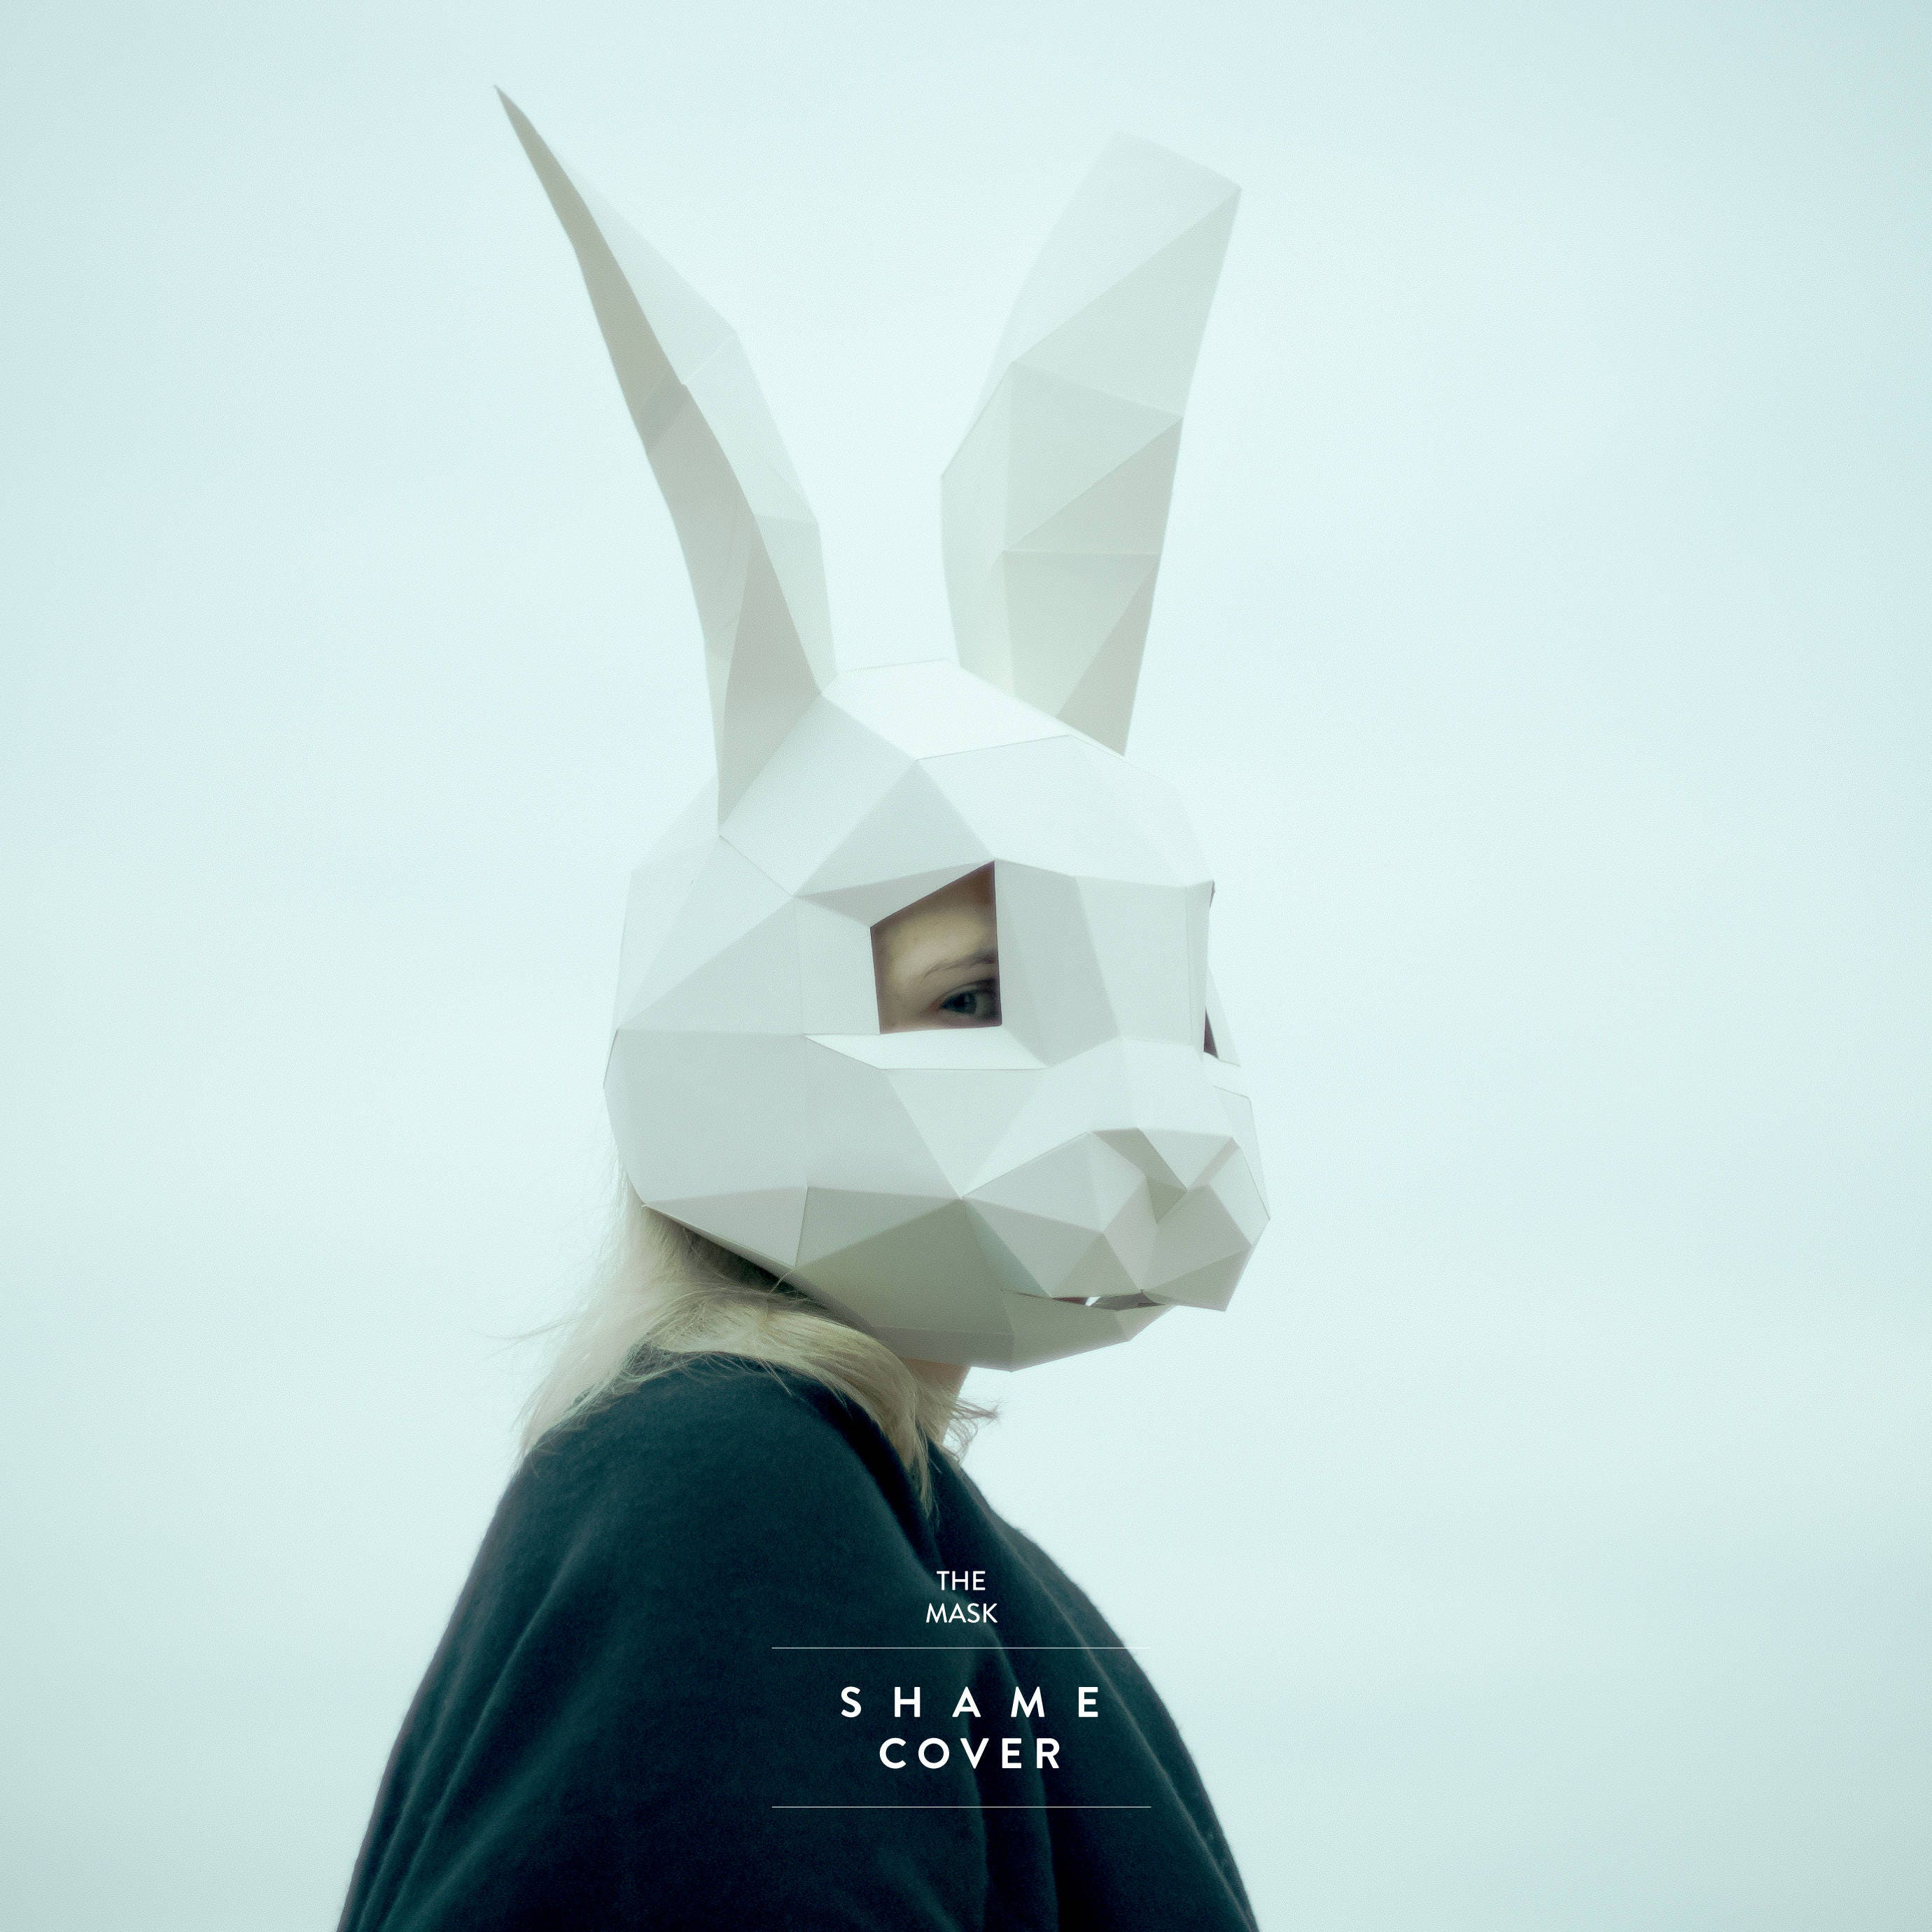 Rabbit MaskBunny MaskDIY 3D MaskPDFPolygon Paper